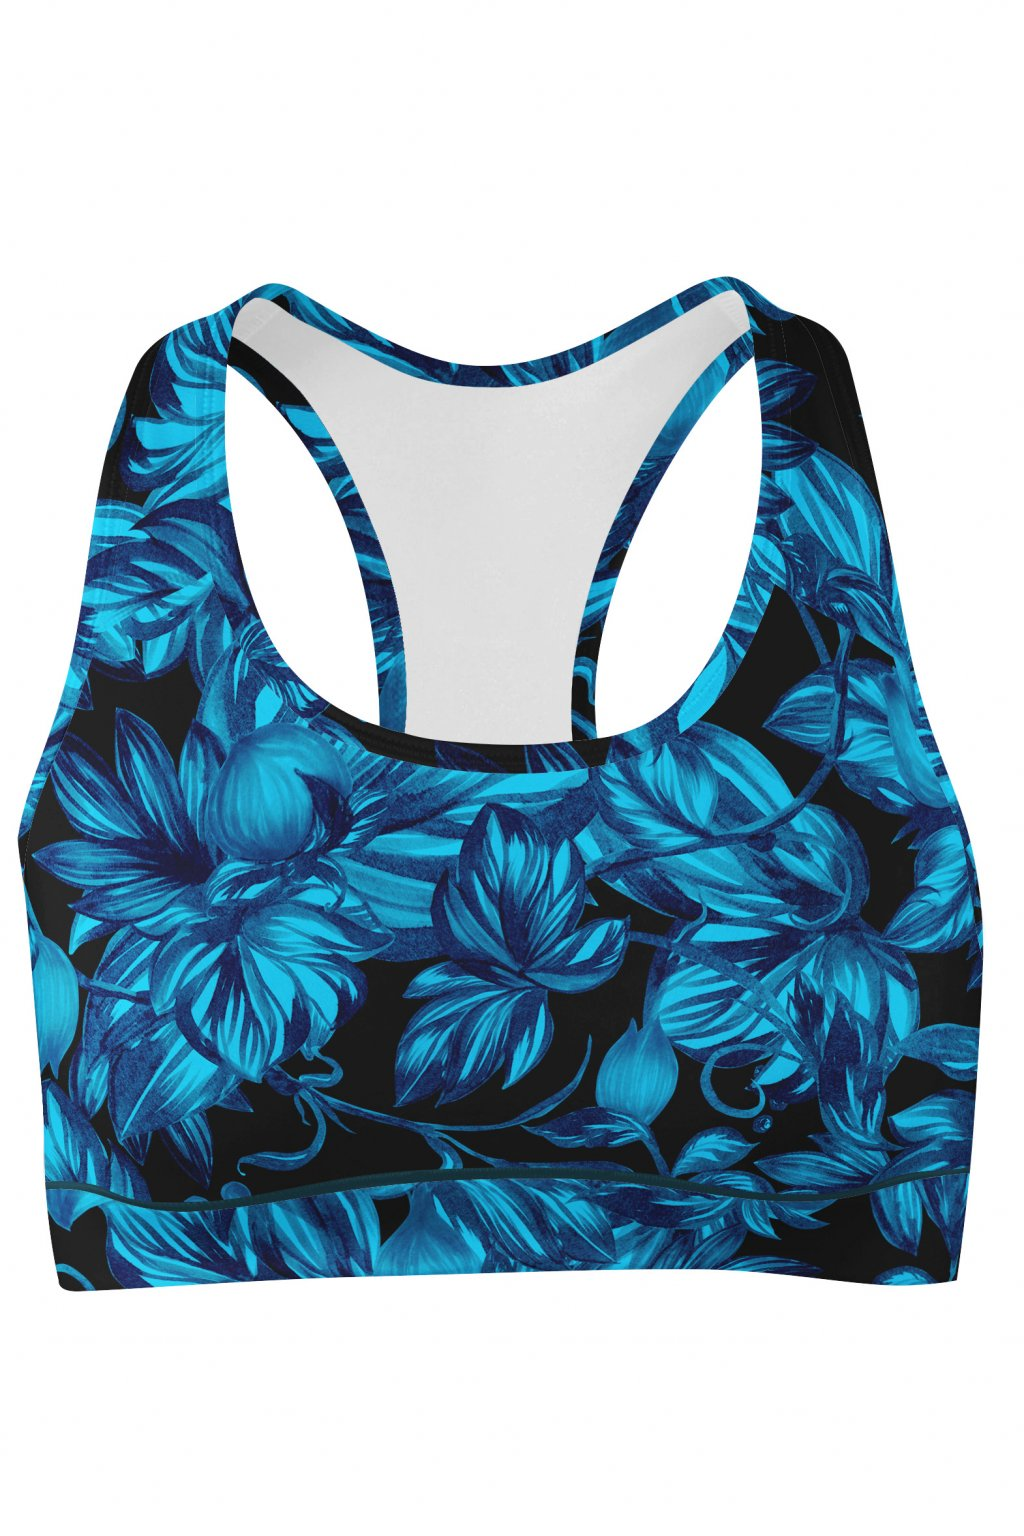 tropical garden sport bra front by utopy